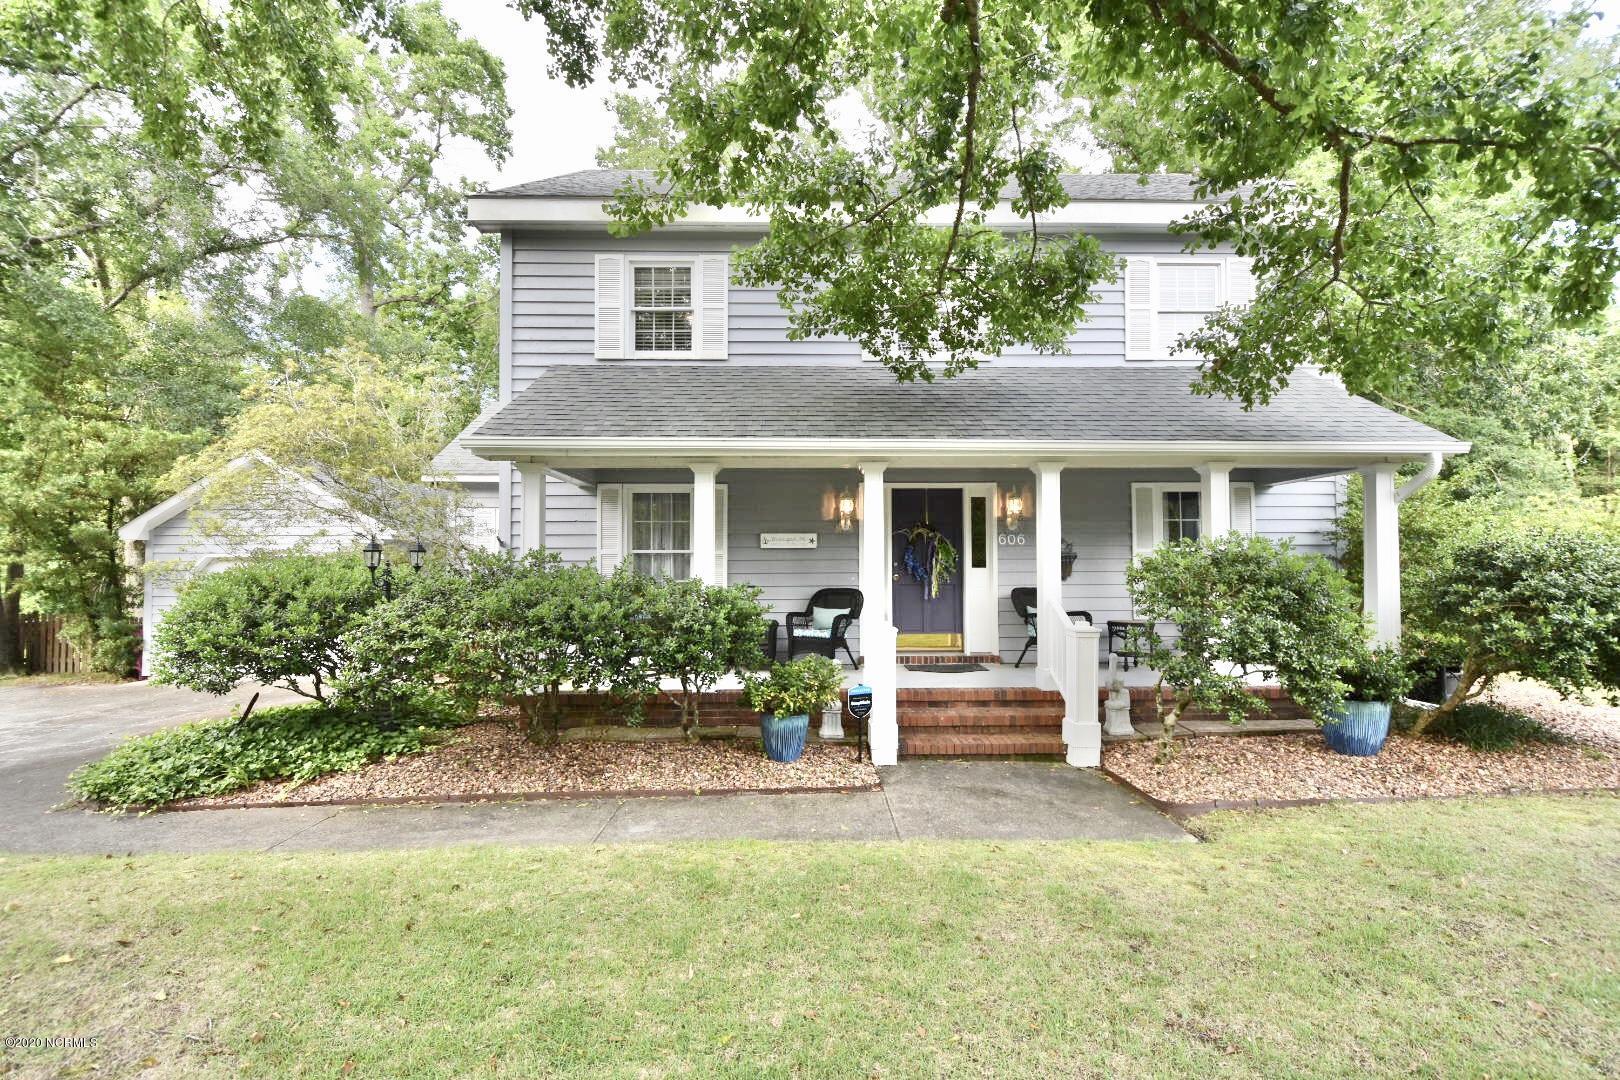 606 Aquarius Drive, Wilmington, North Carolina 28411, 3 Bedrooms Bedrooms, ,2 BathroomsBathrooms,Residential,For Sale,Aquarius,100223618